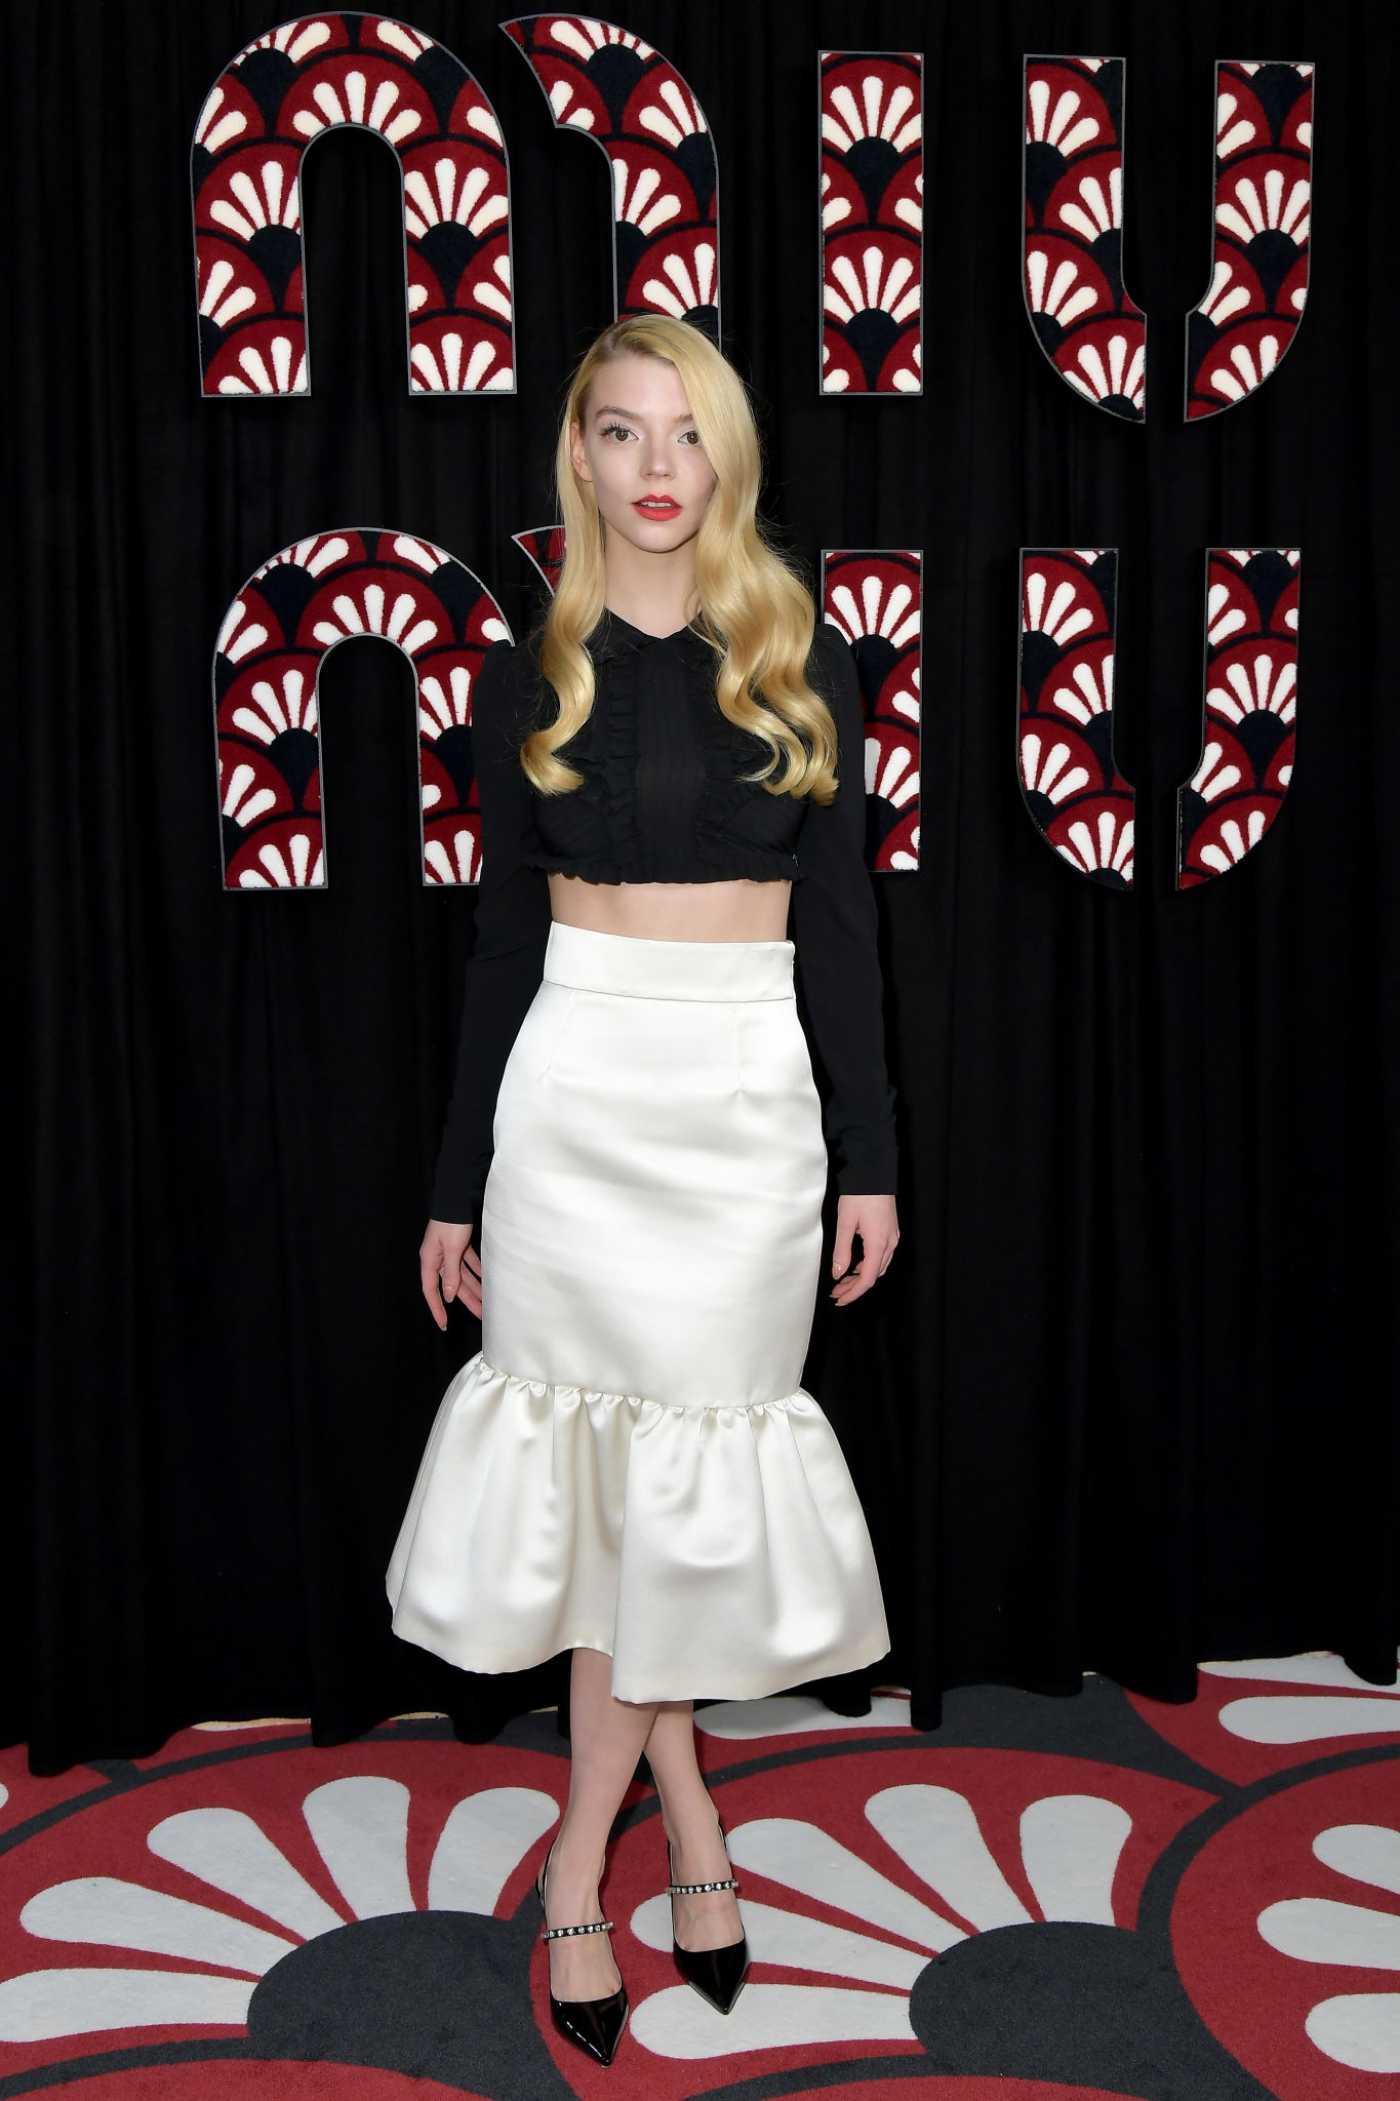 Anya Taylor-Joy Attends 2020 Miu Miu Fashion Show in Paris 03/03/2020